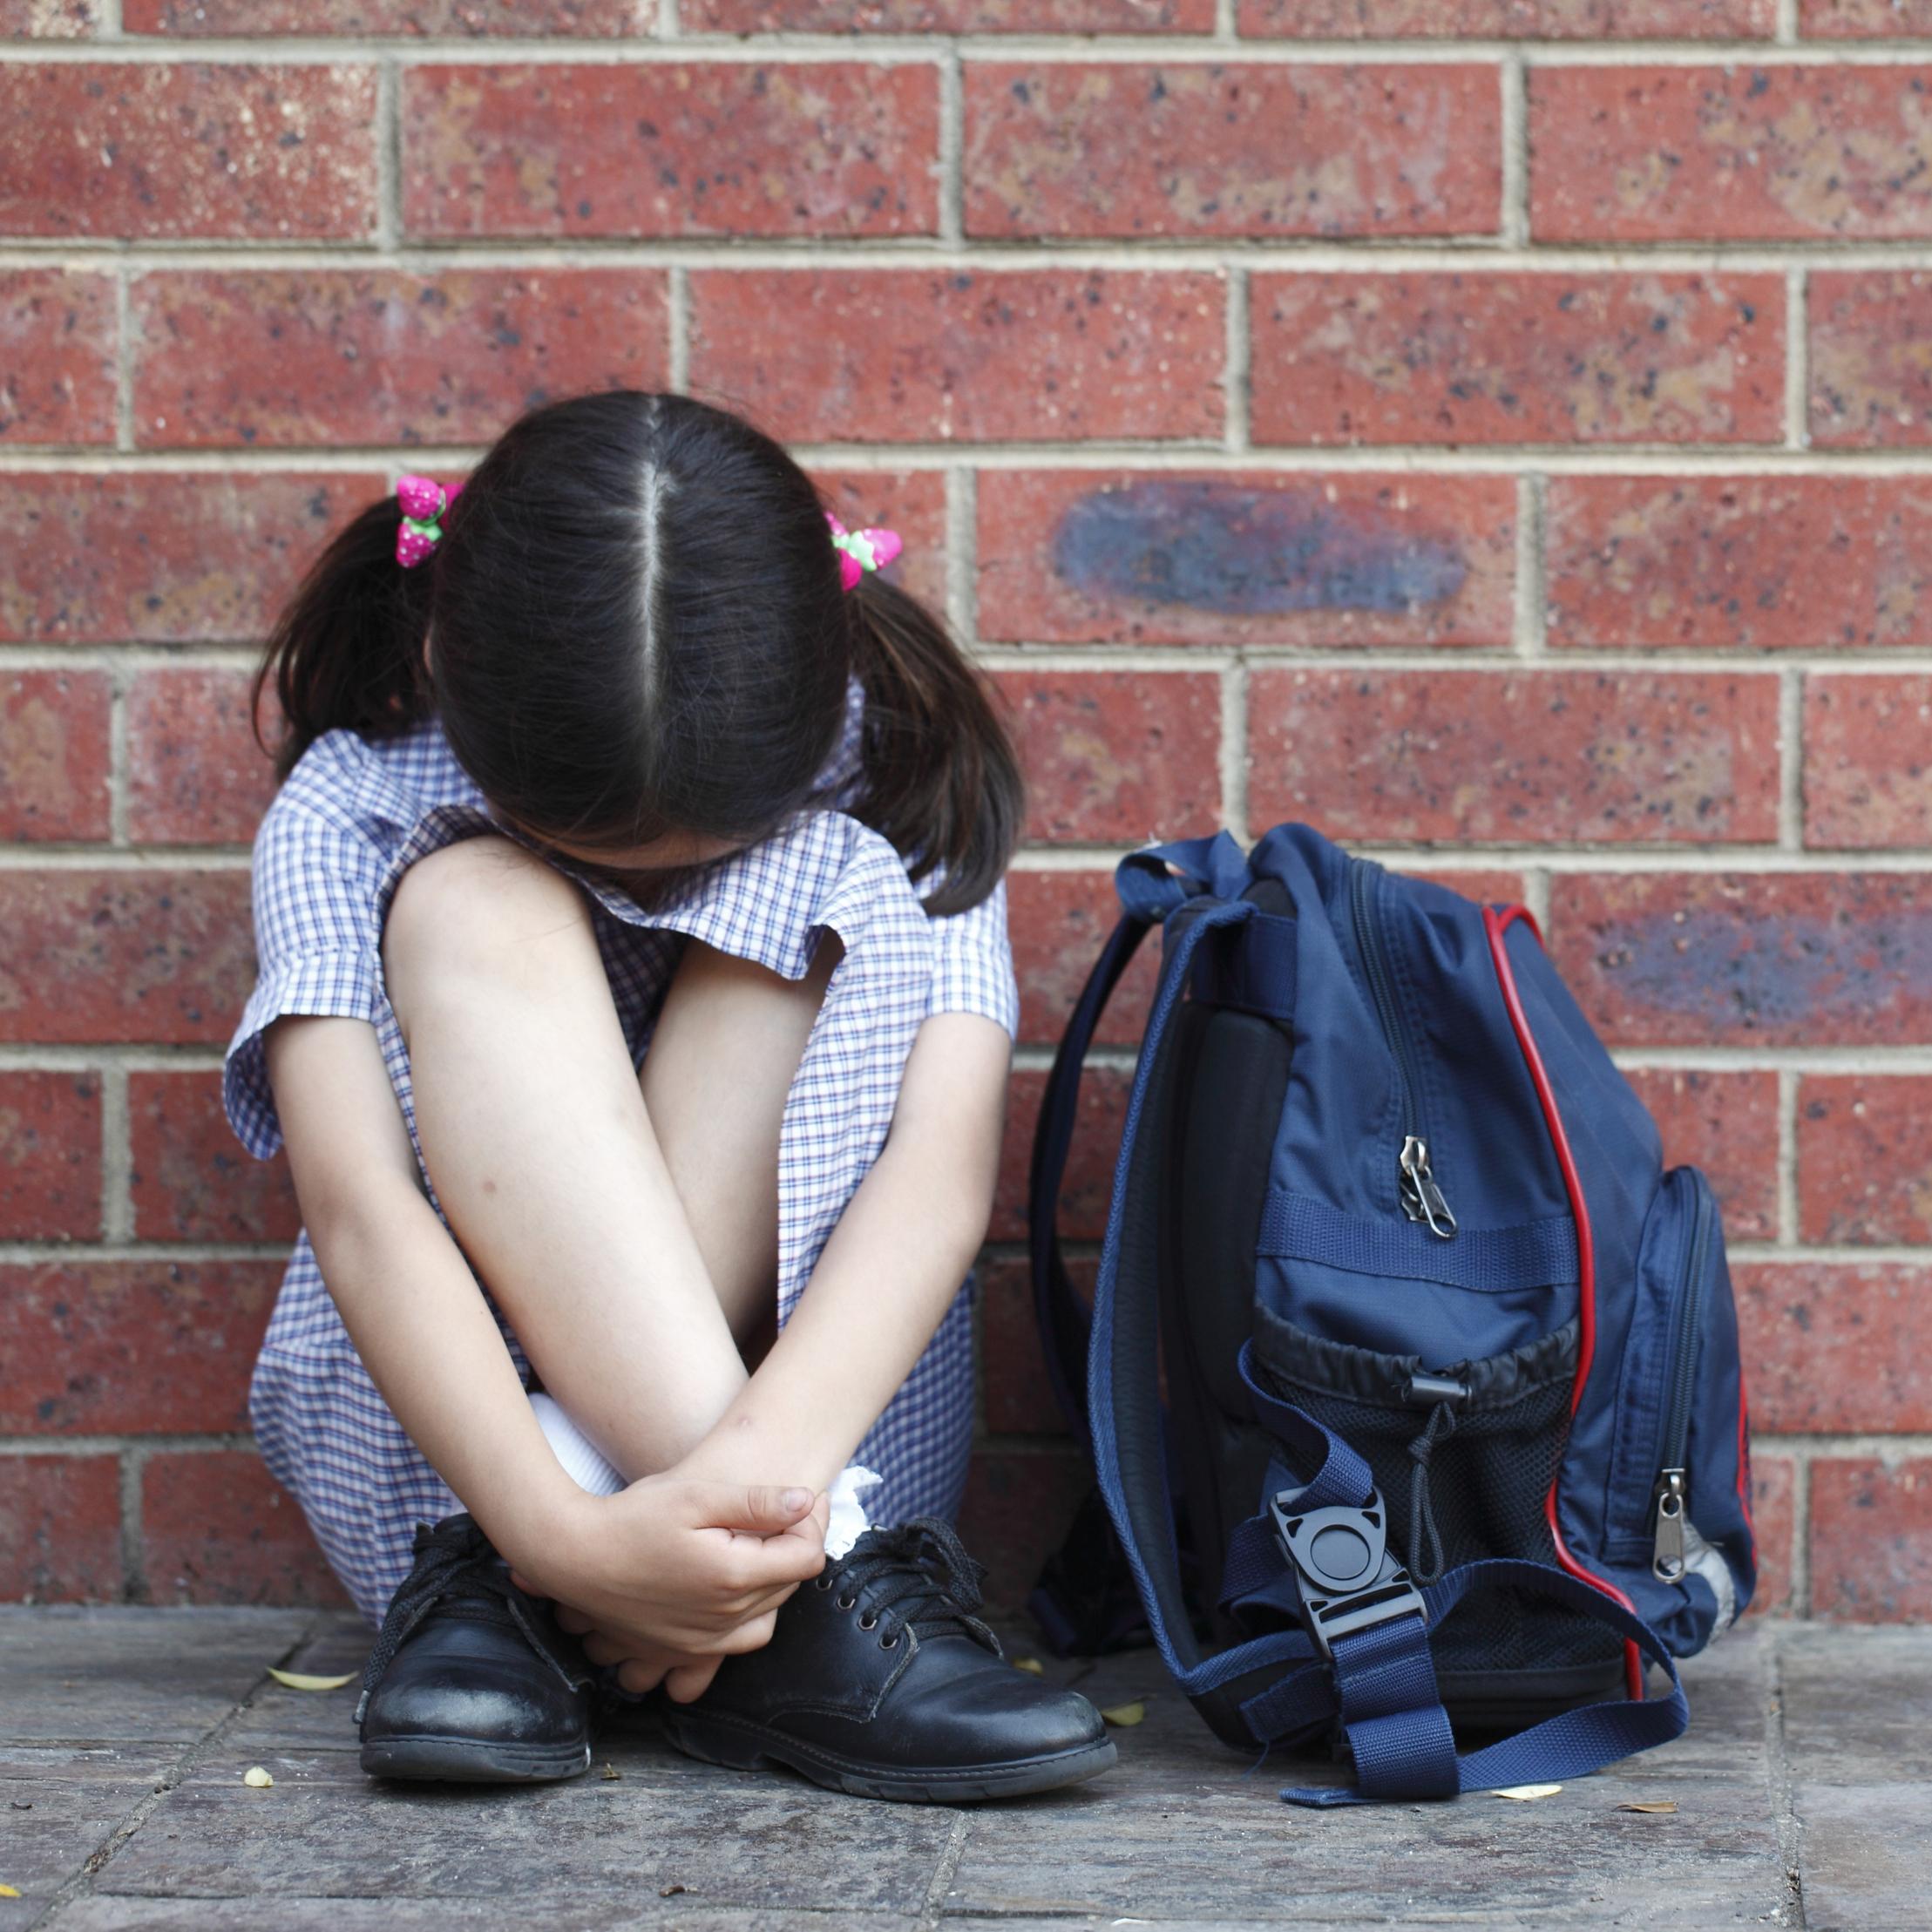 Back To School Prep: Bully Prevention